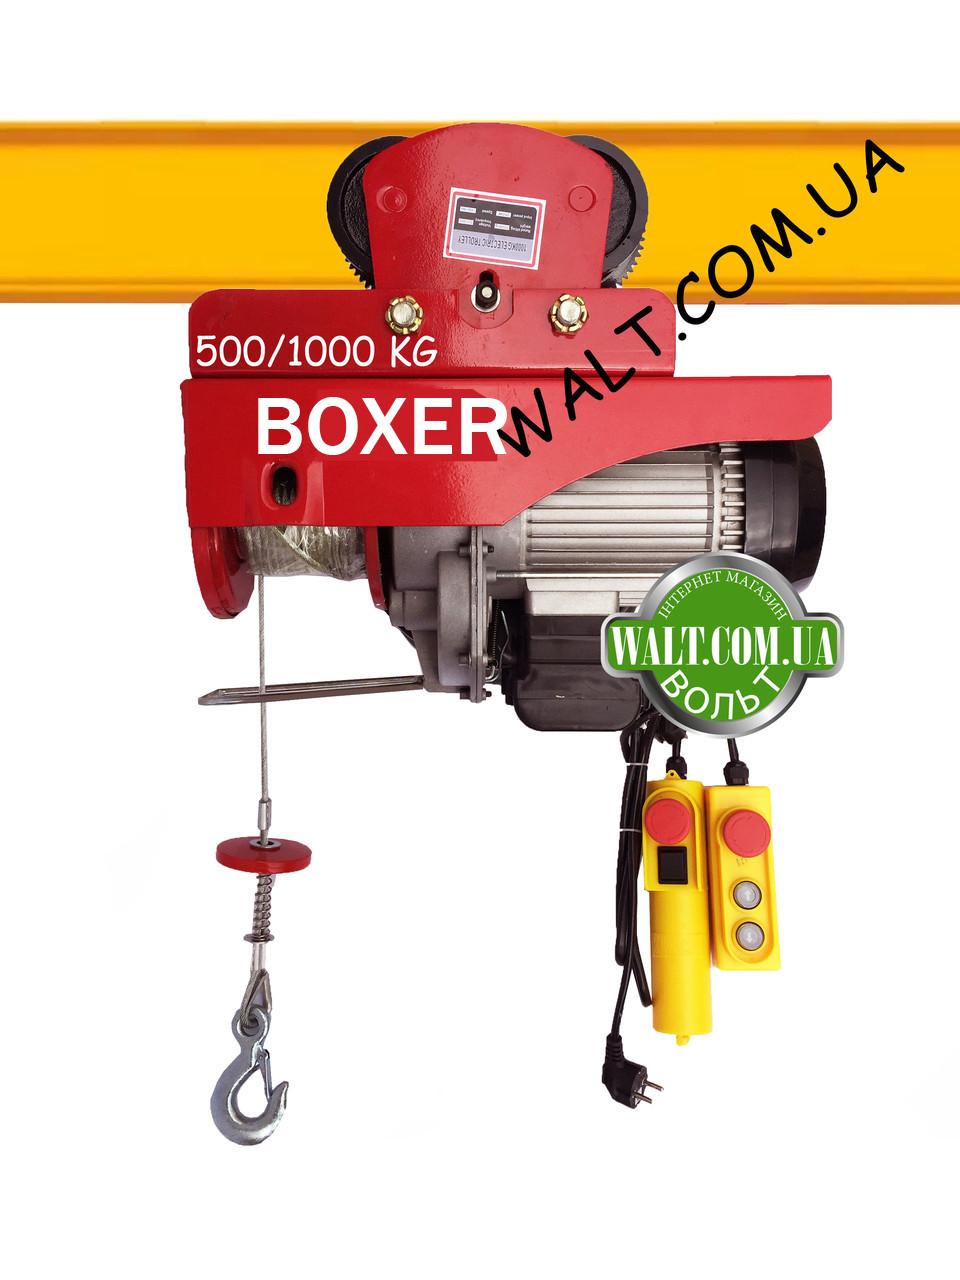 Таль с кареткой,тельфер BOXER 3000W.500/1000 KG